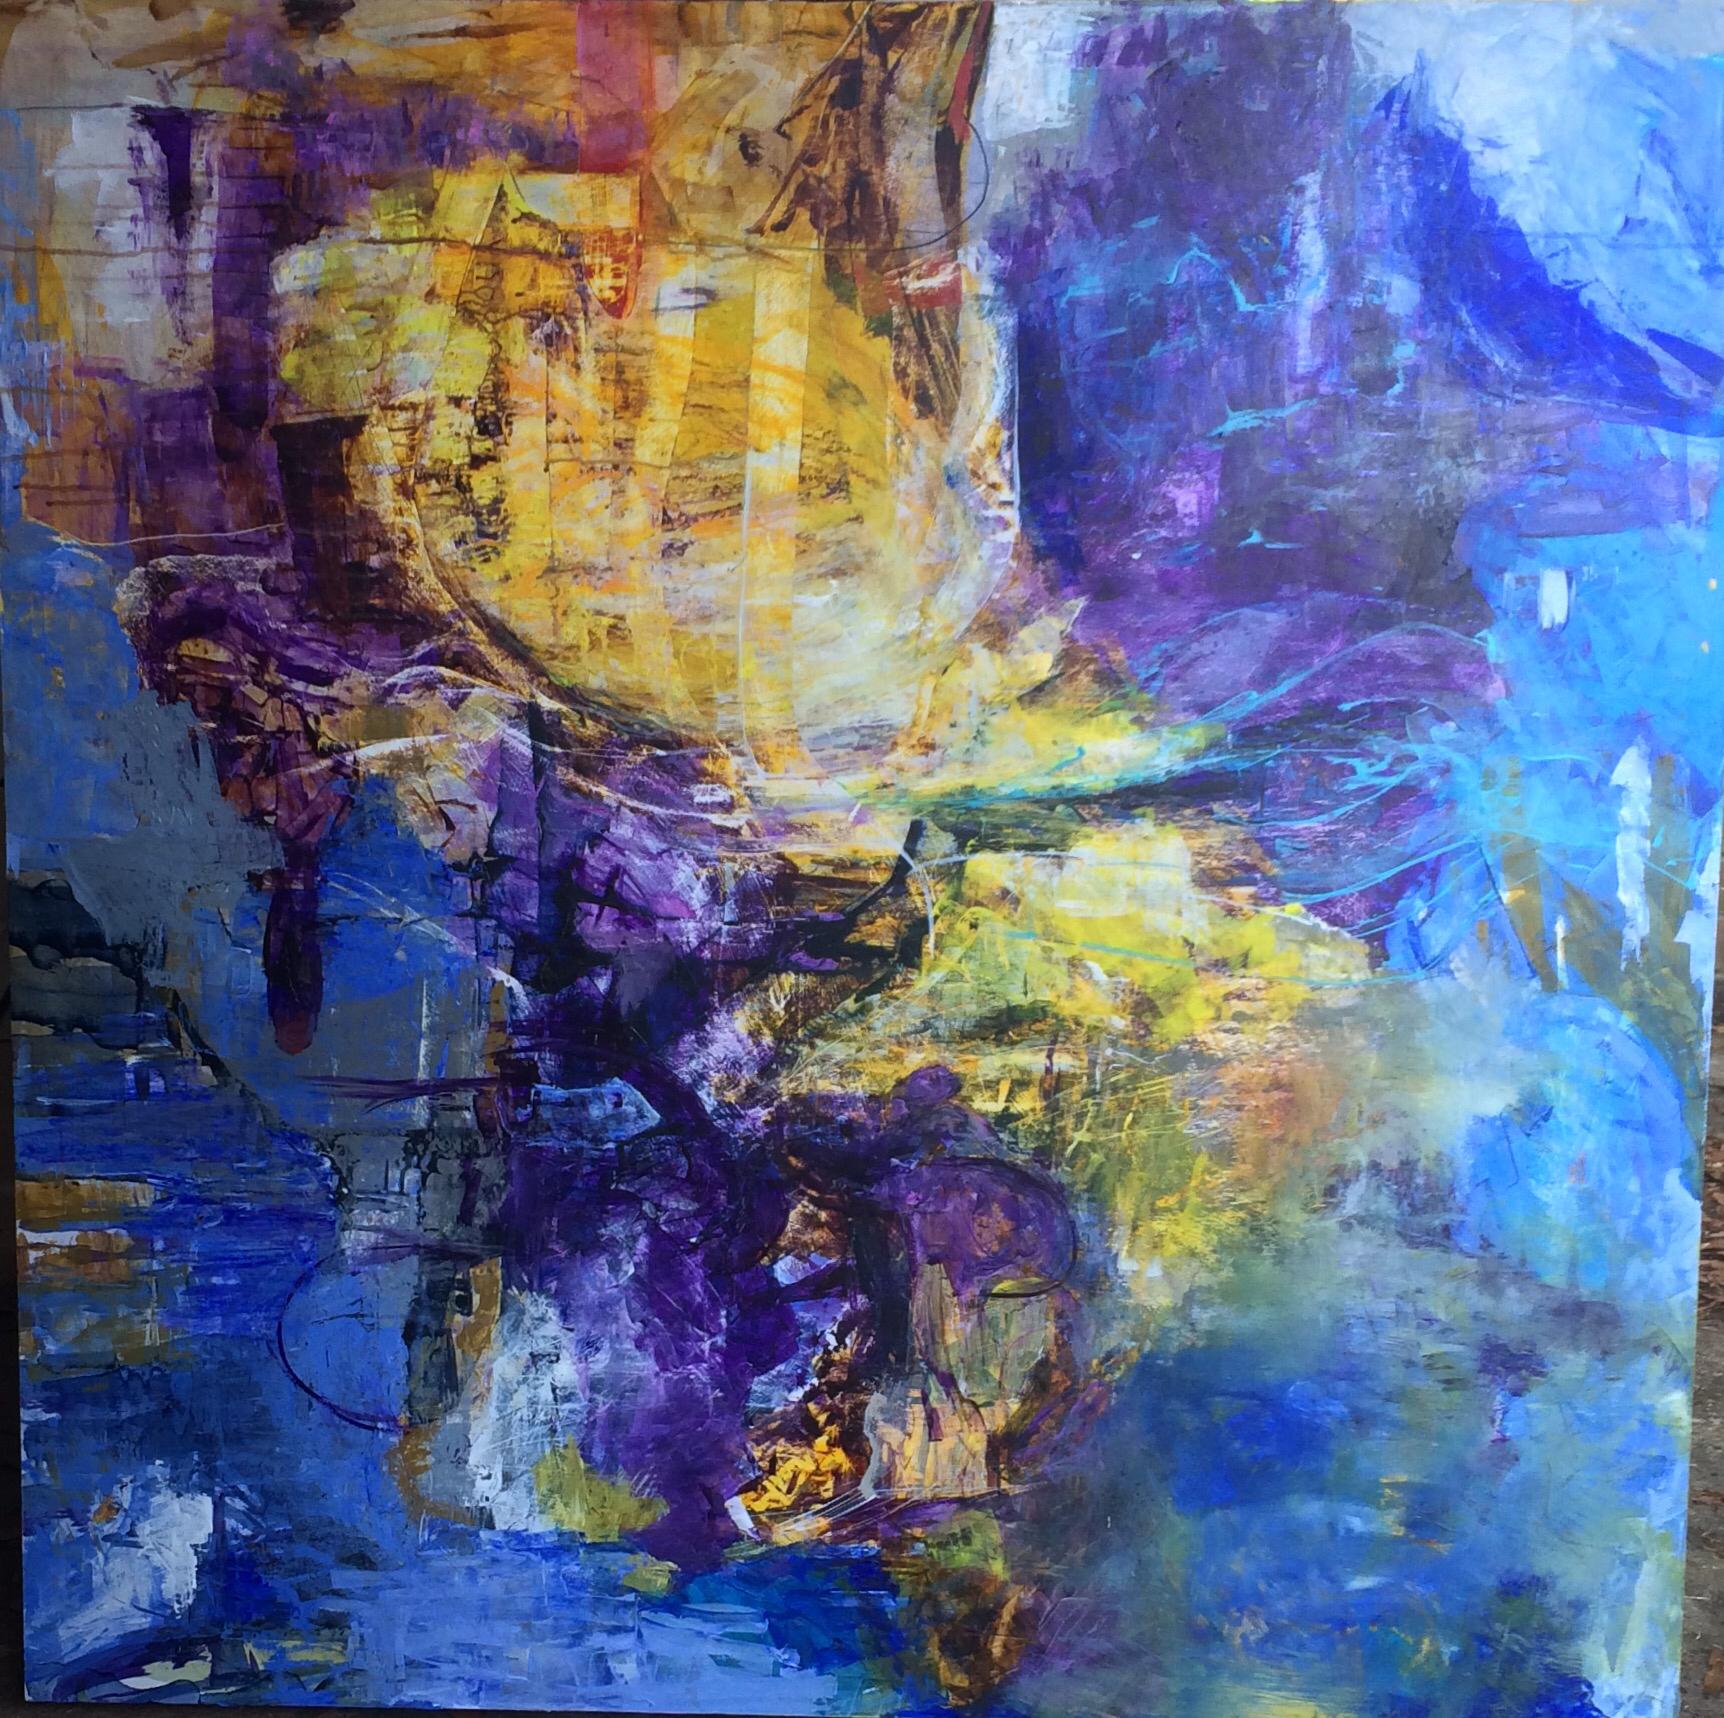 Owens_Artwork_The-Whisper-49x48-.jpg